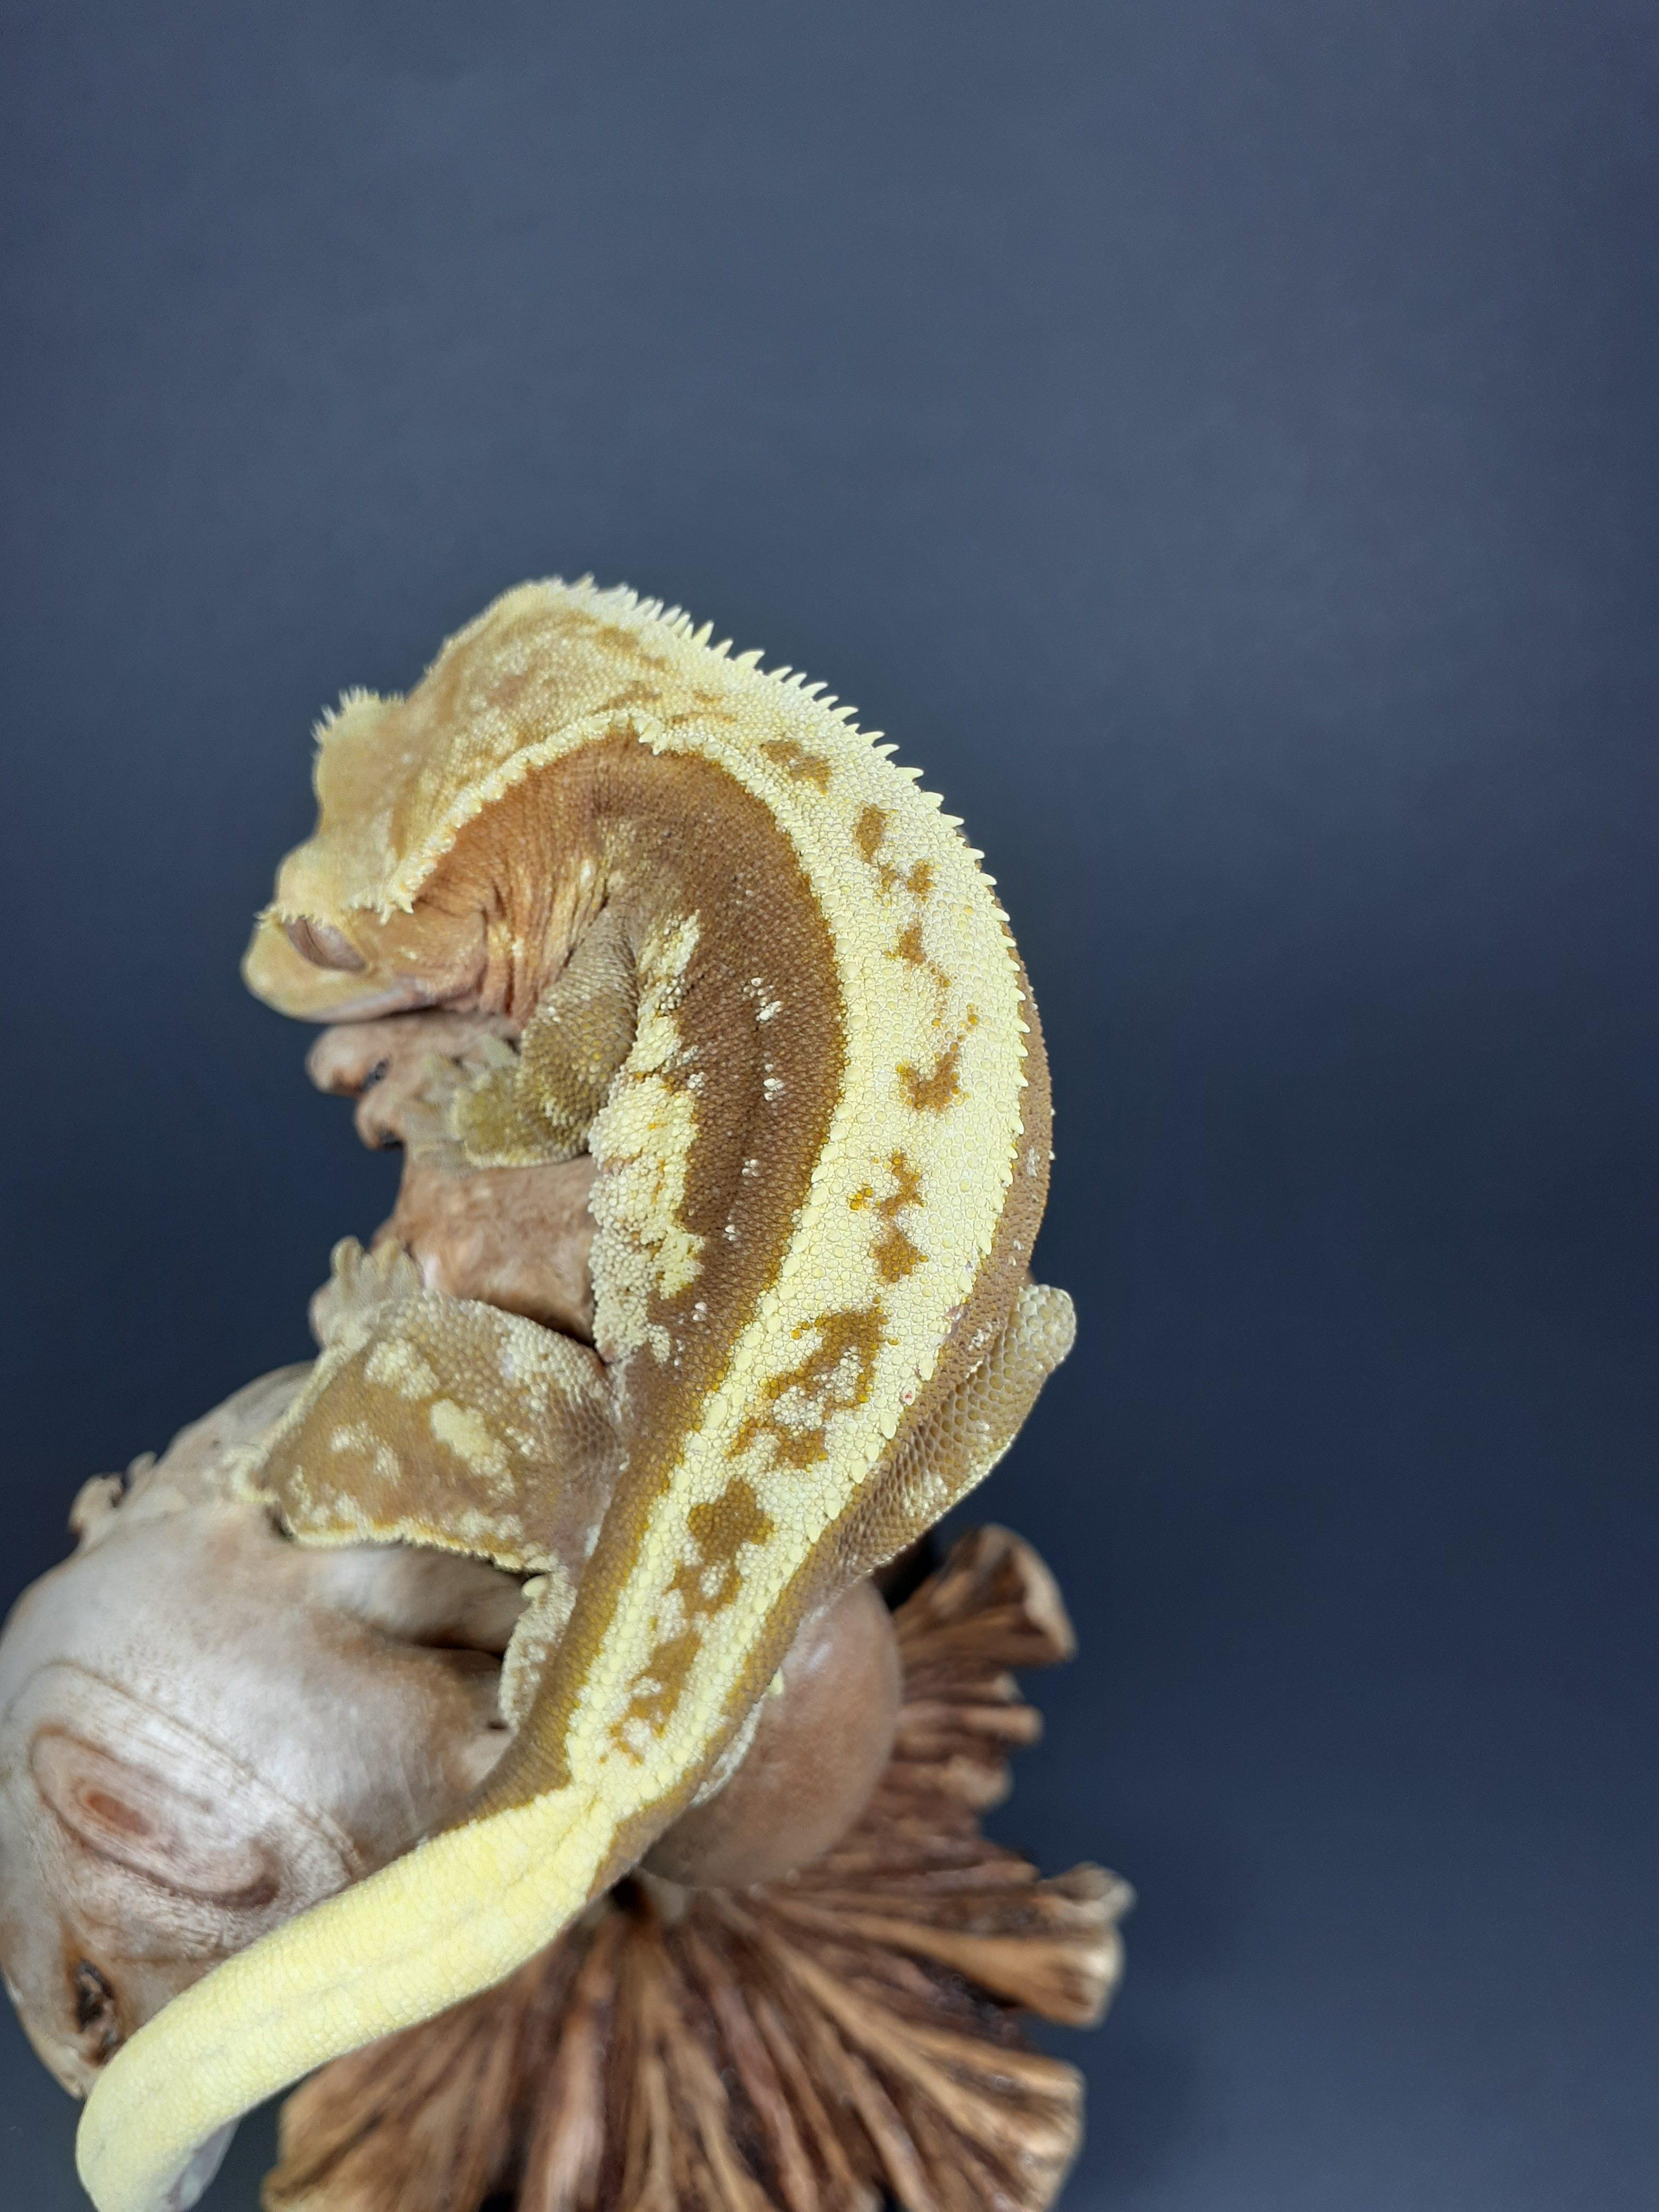 pinstripe crested gecko